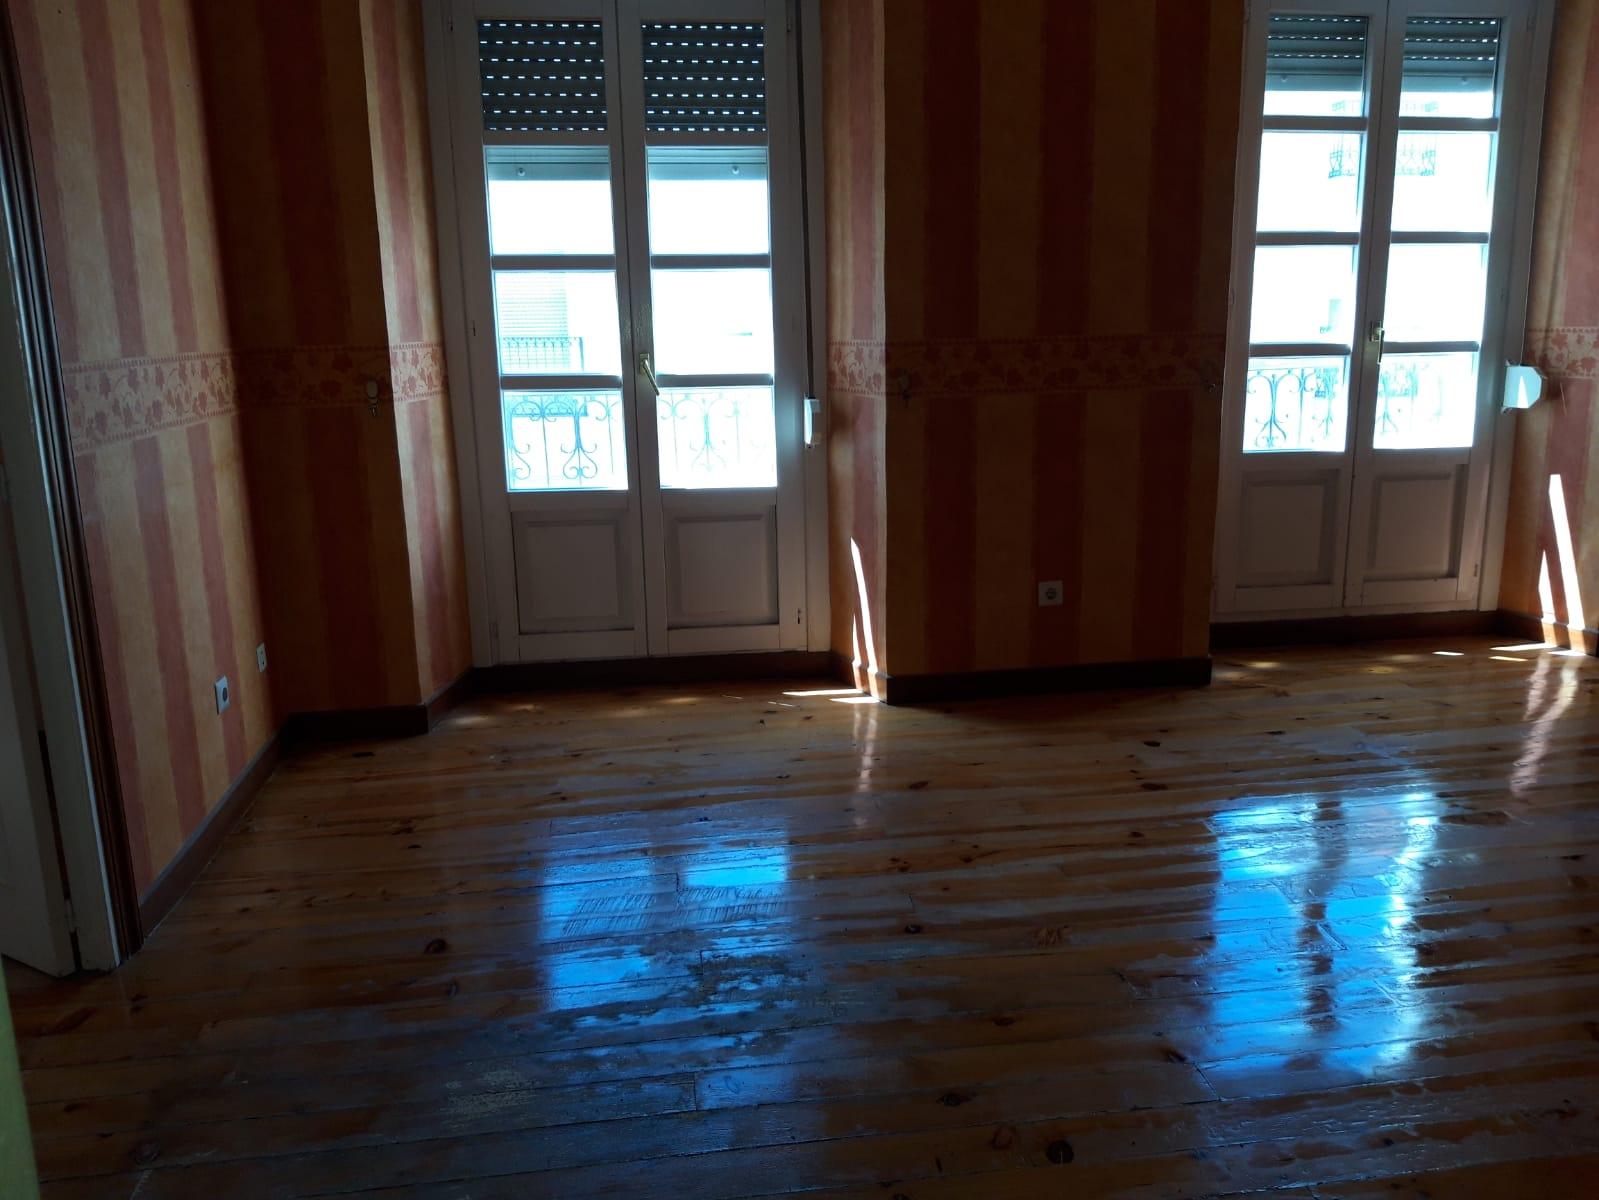 Piso en venta en Zabalgunea/ensanche, Vitoria-gasteiz, Álava, Calle Postas, 285.000 €, 3 habitaciones, 1 baño, 114 m2